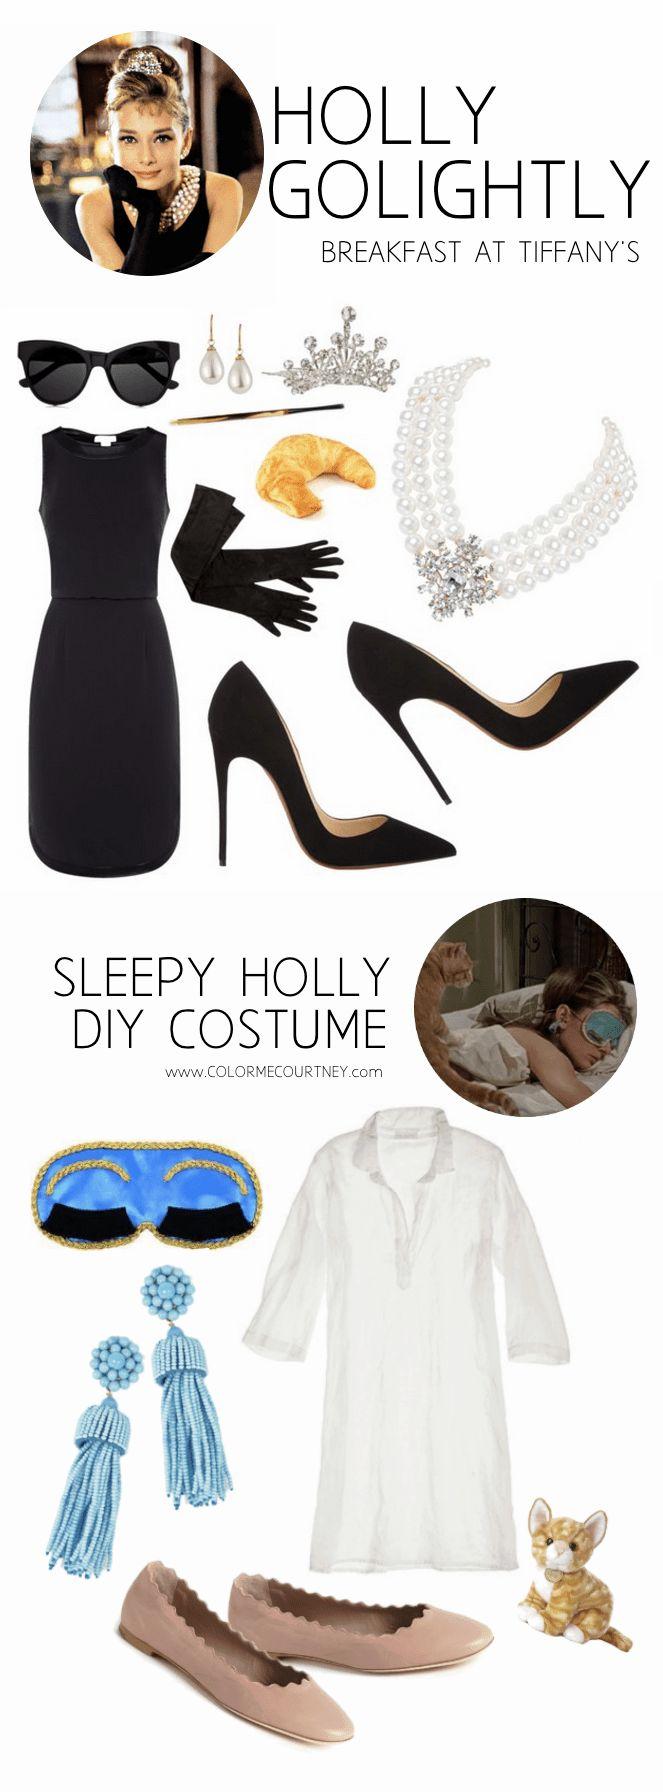 Breakfast at Tiffany's DIY Halloween costumes #falltime #howtowear